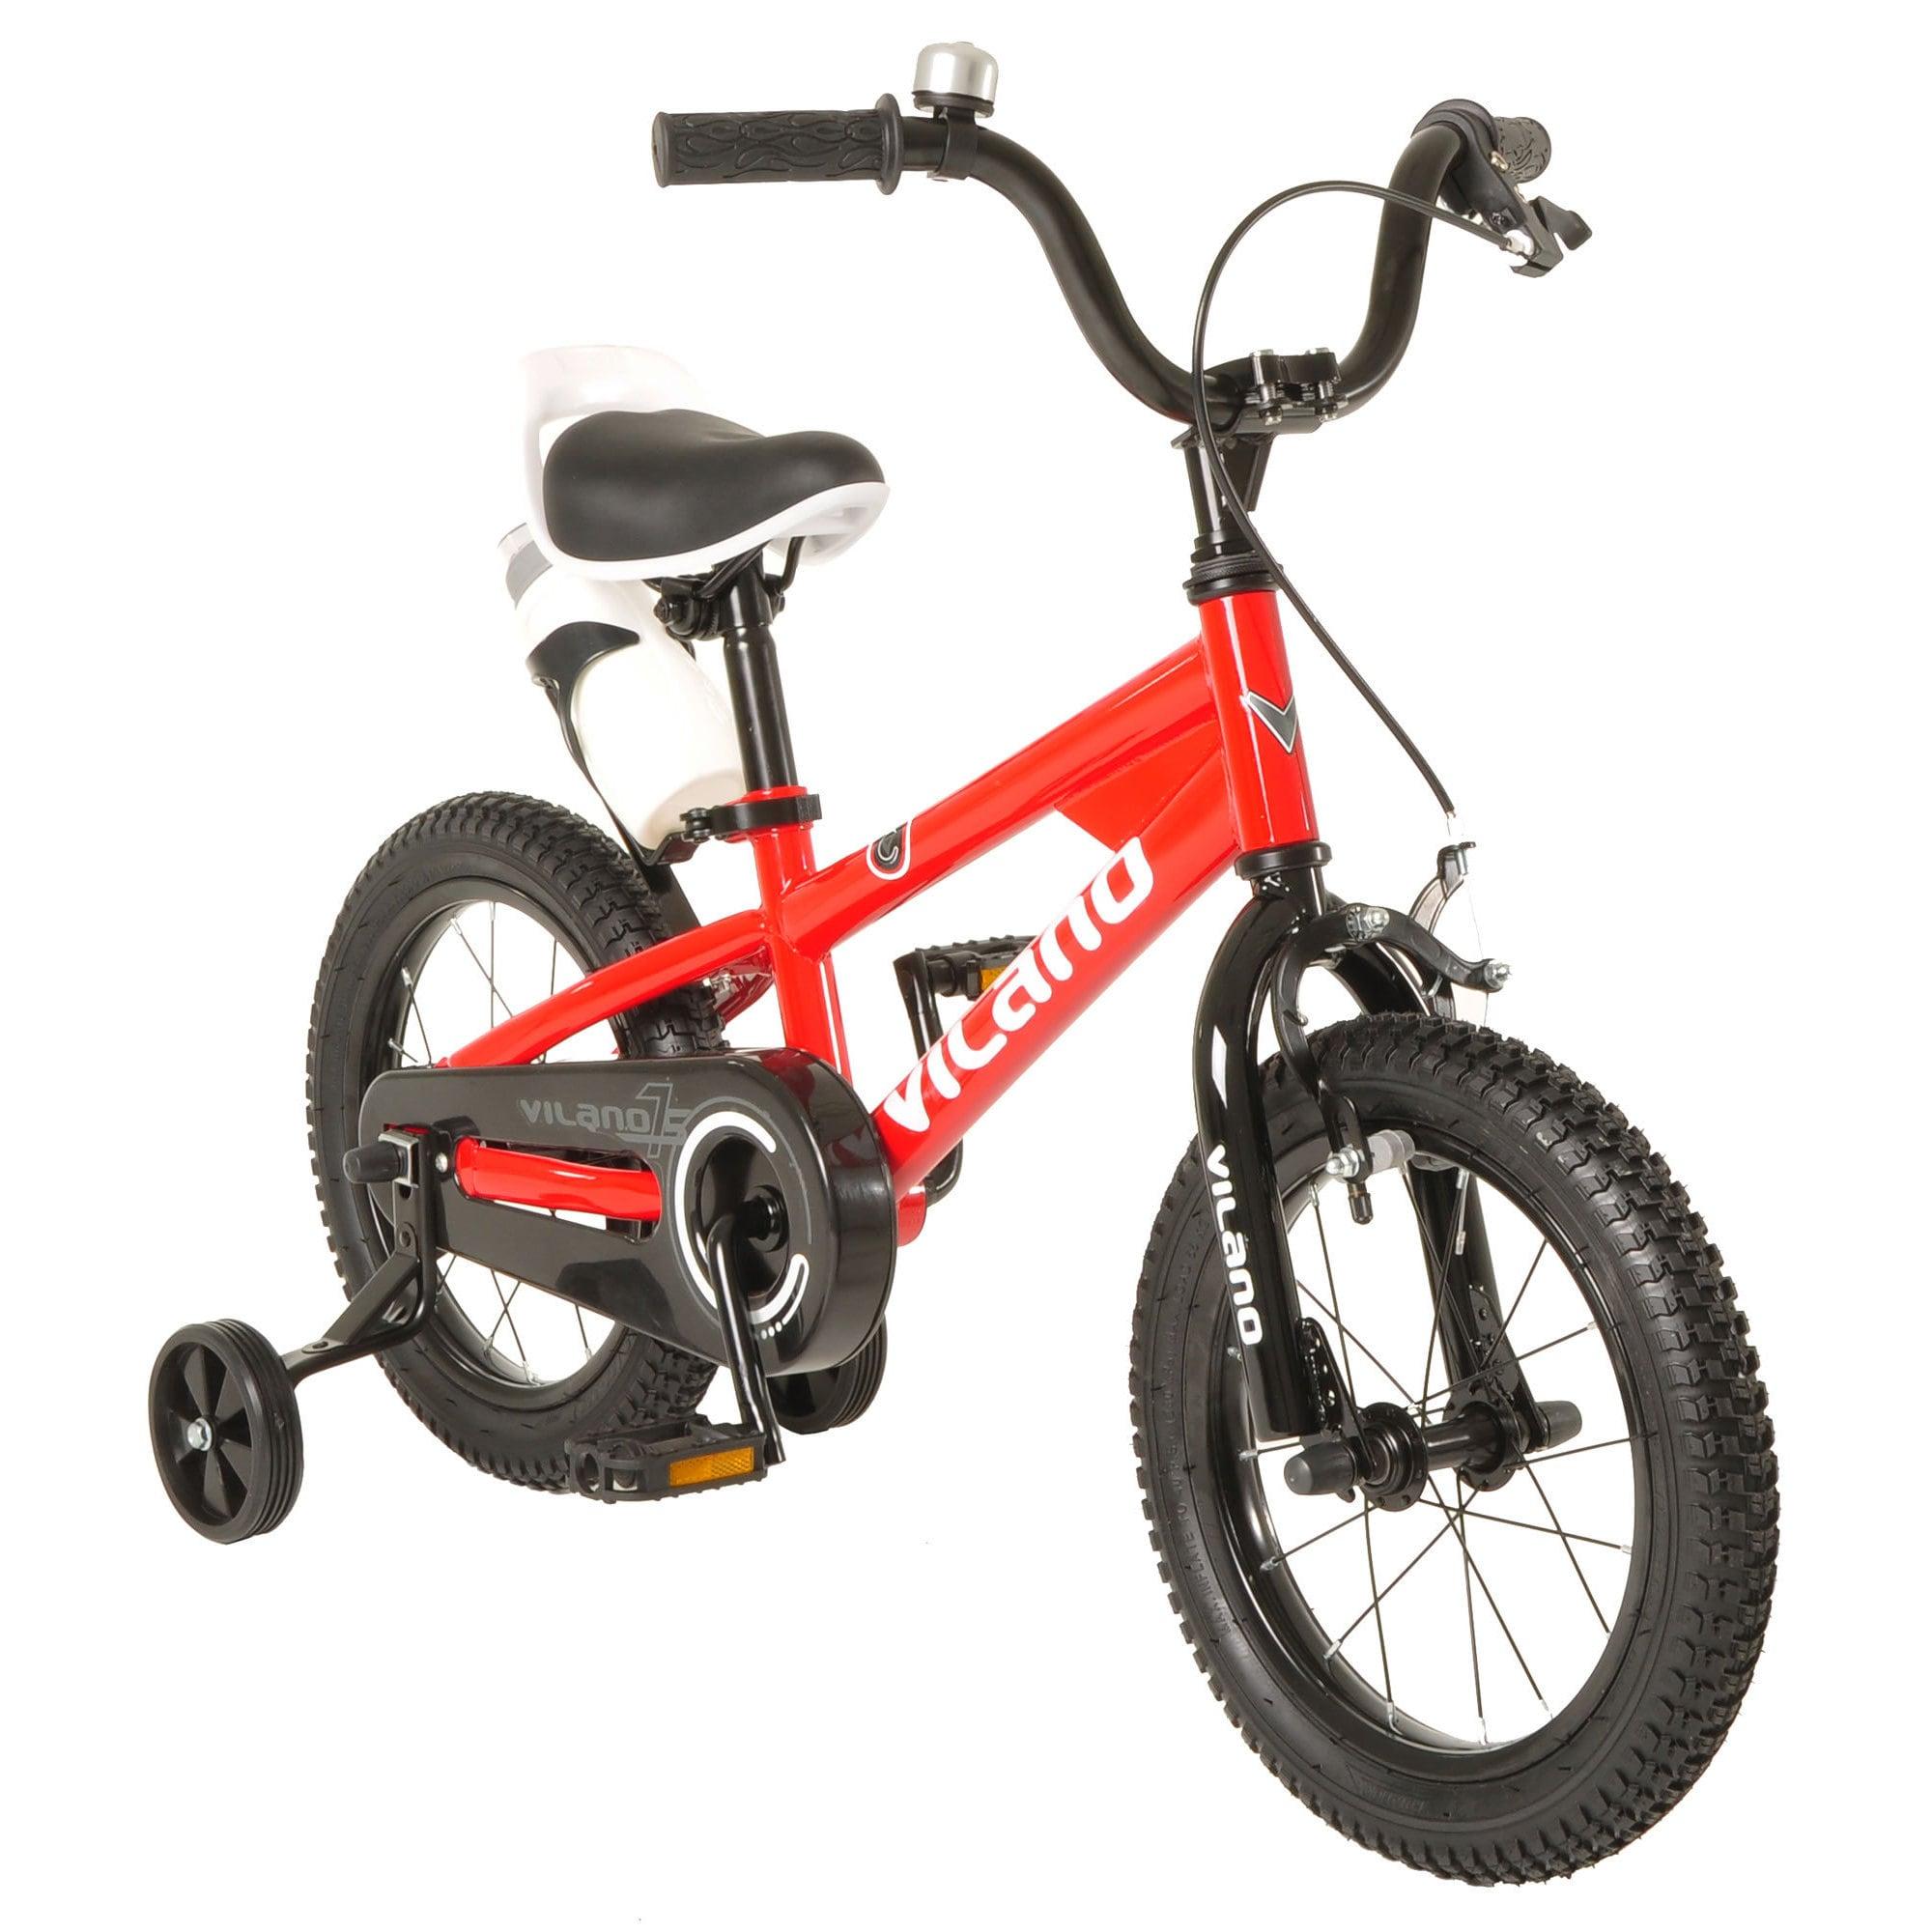 Vilano Boys' Kids' 16-inch BMX-style Bike (Red)